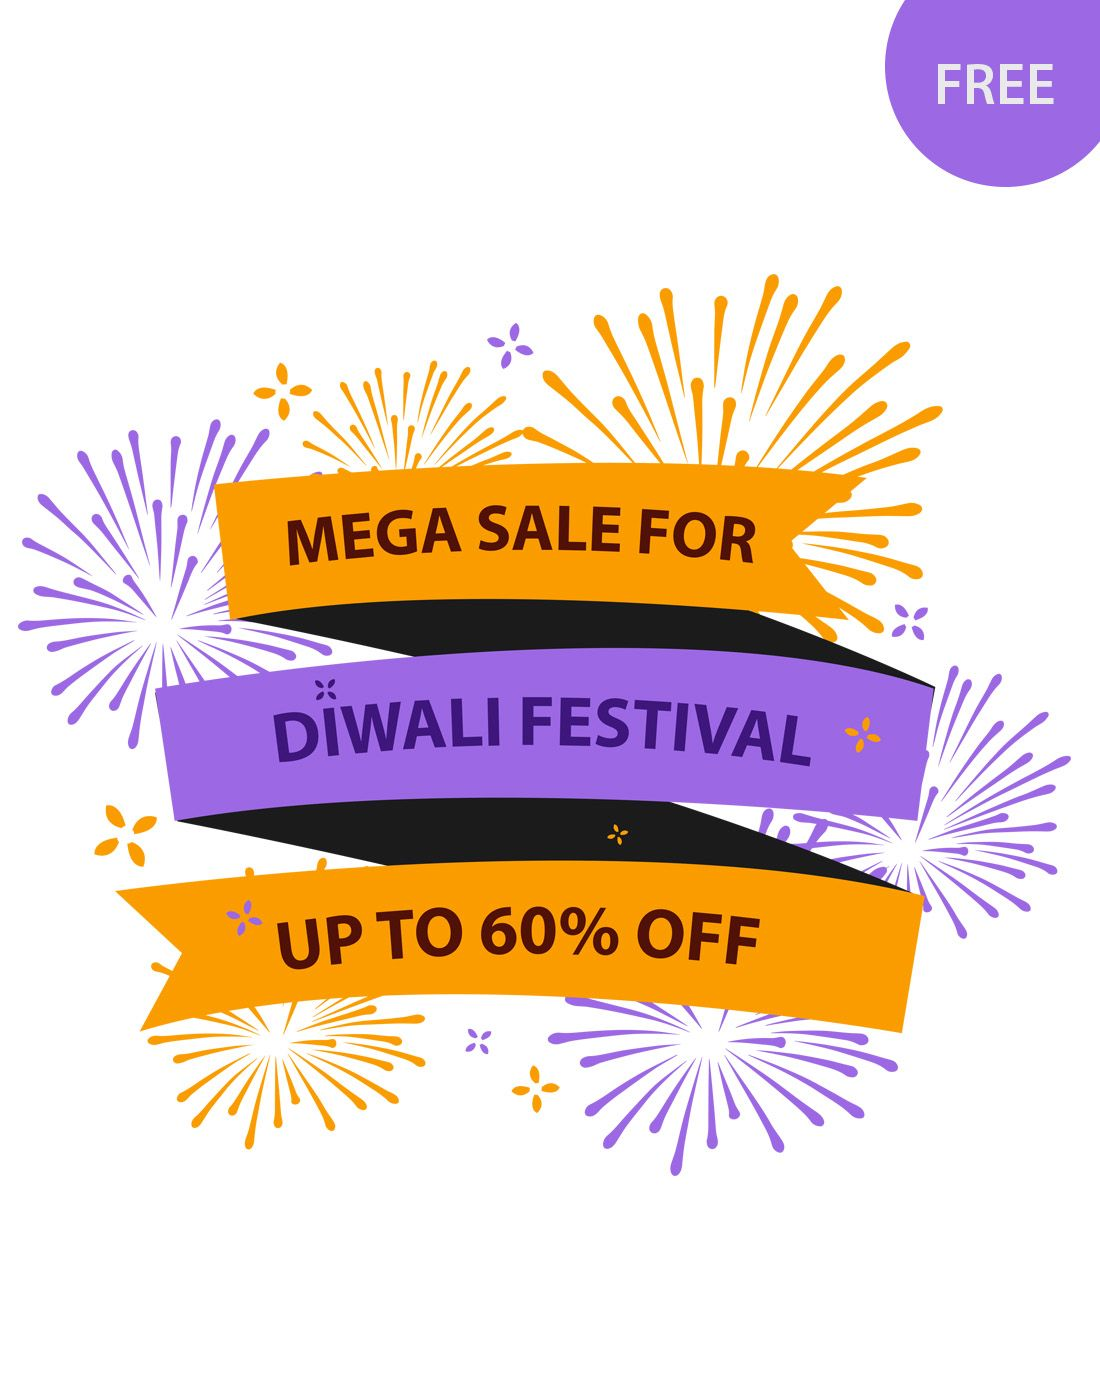 Diwali Pattern Templates Diwali Template And Patterns